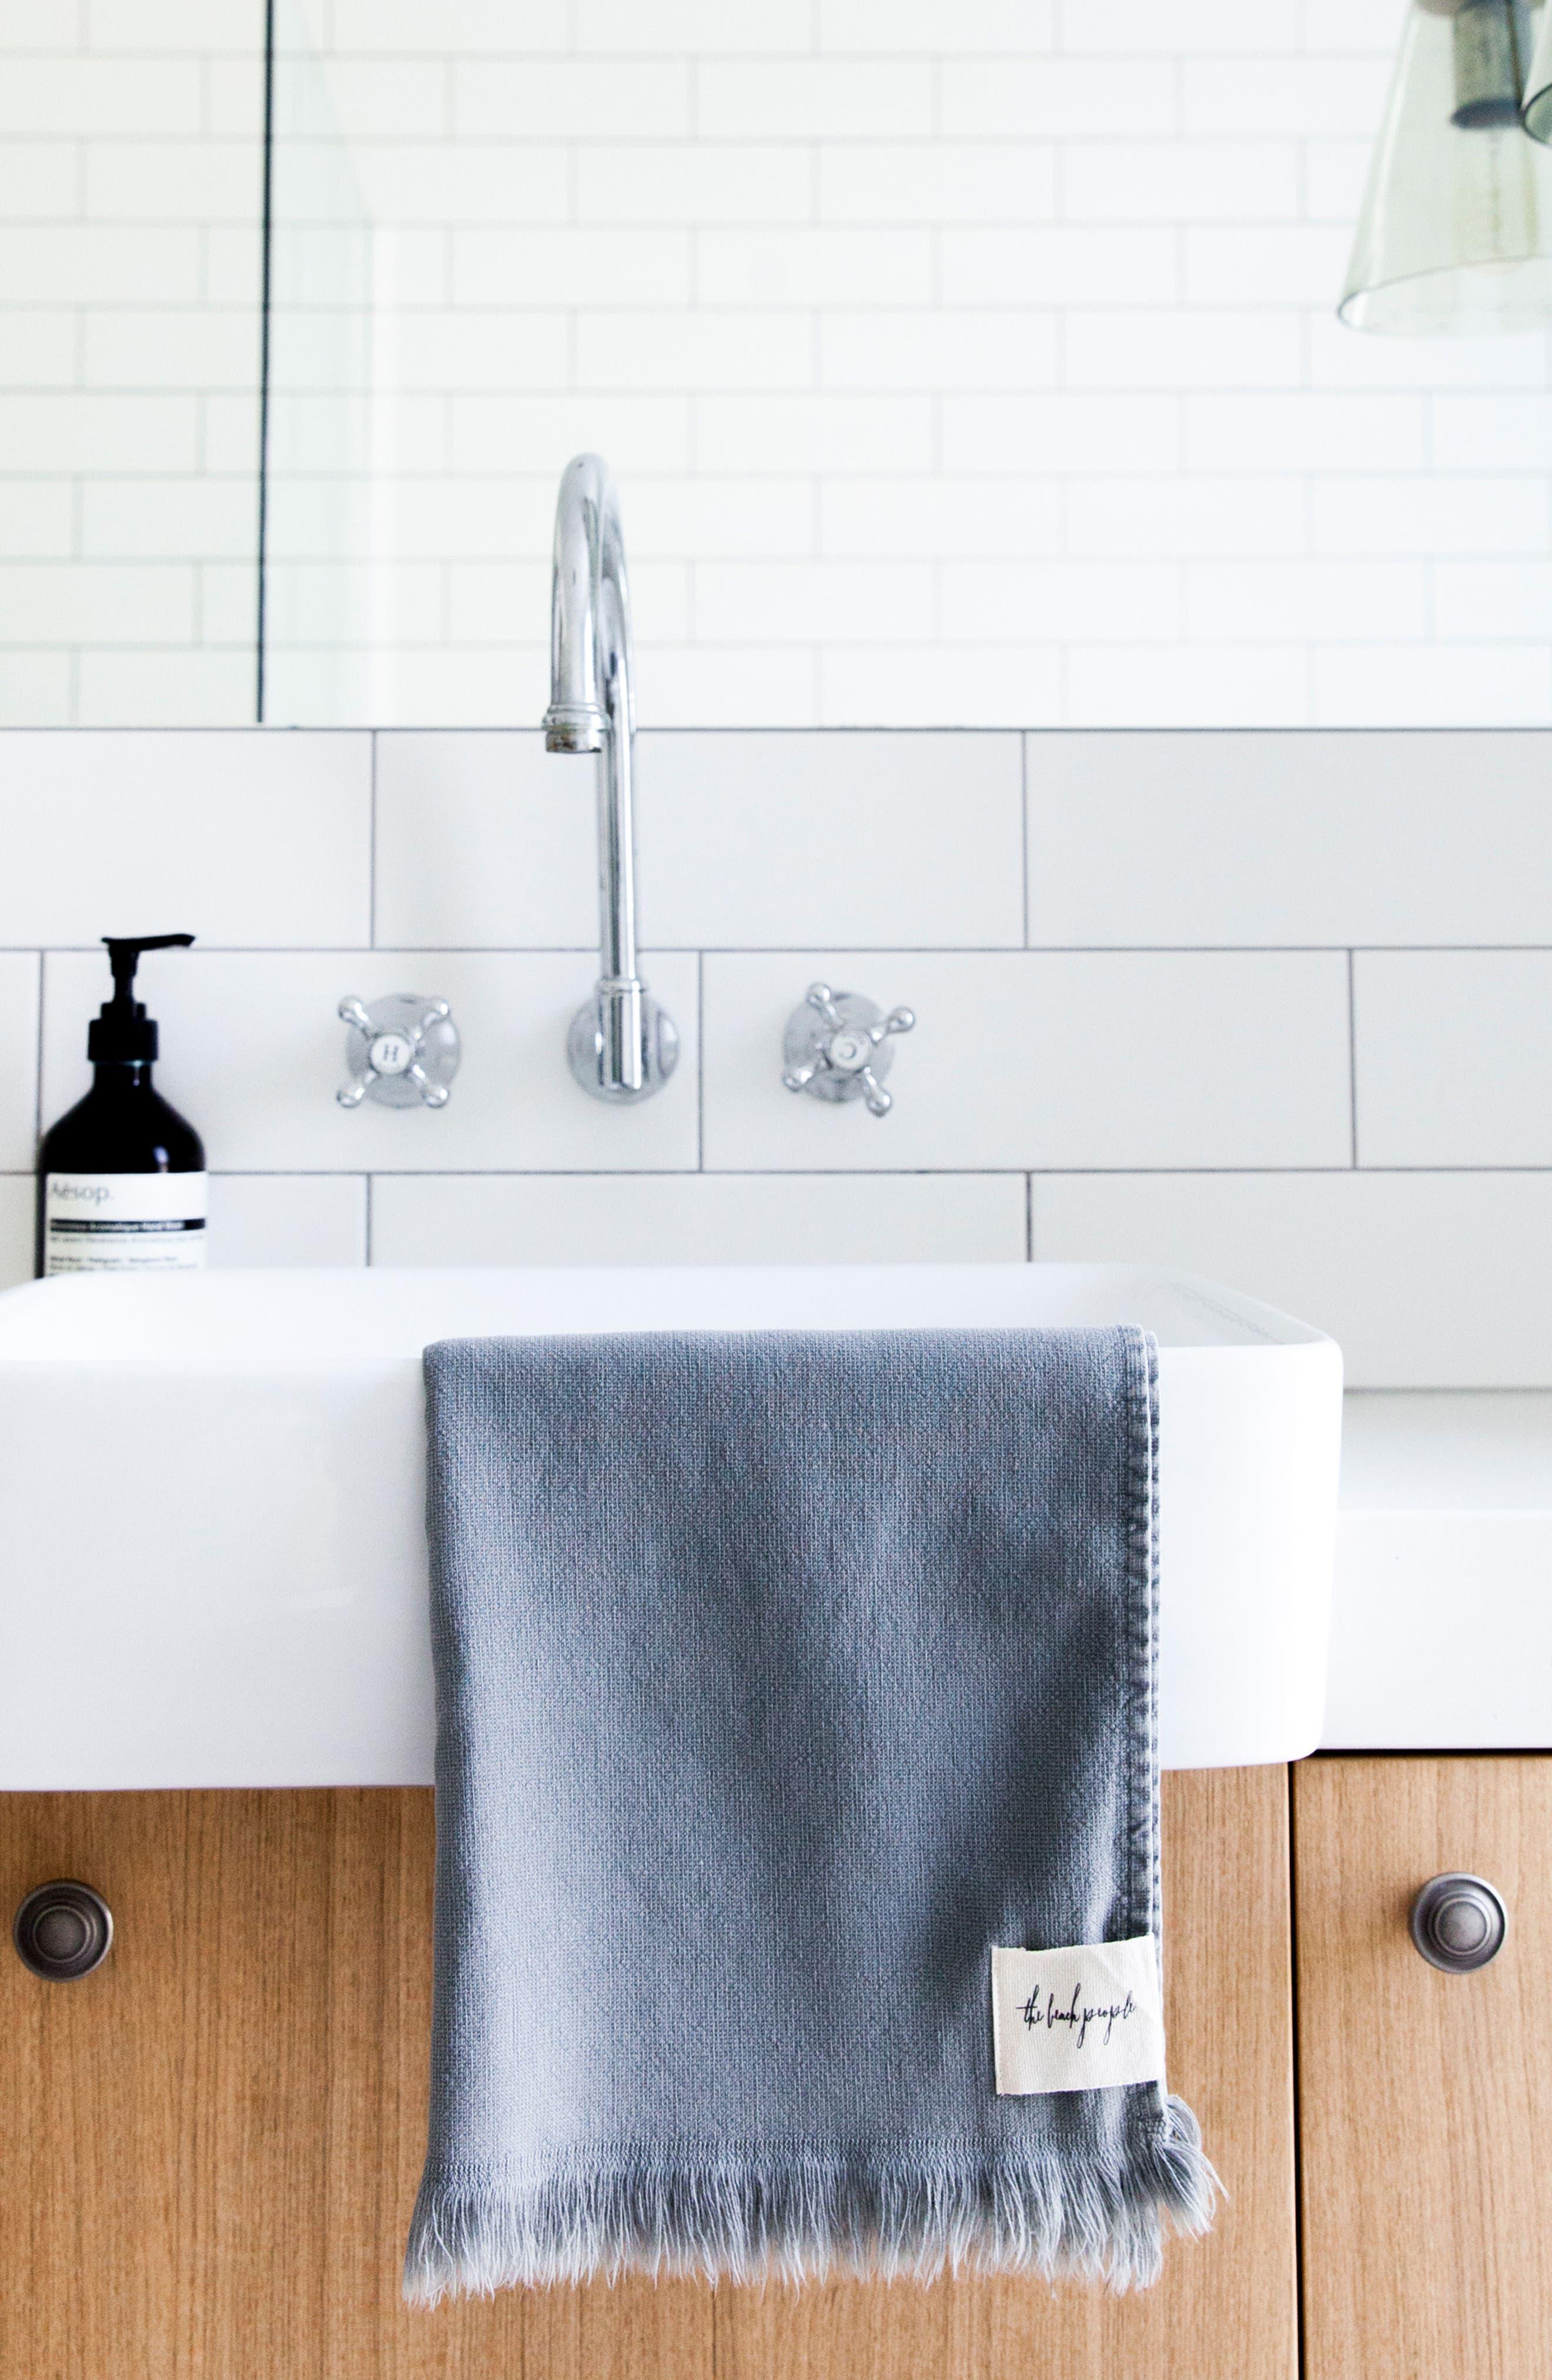 Stonewash Hand Towel,                             Alternate thumbnail 2, color,                             020